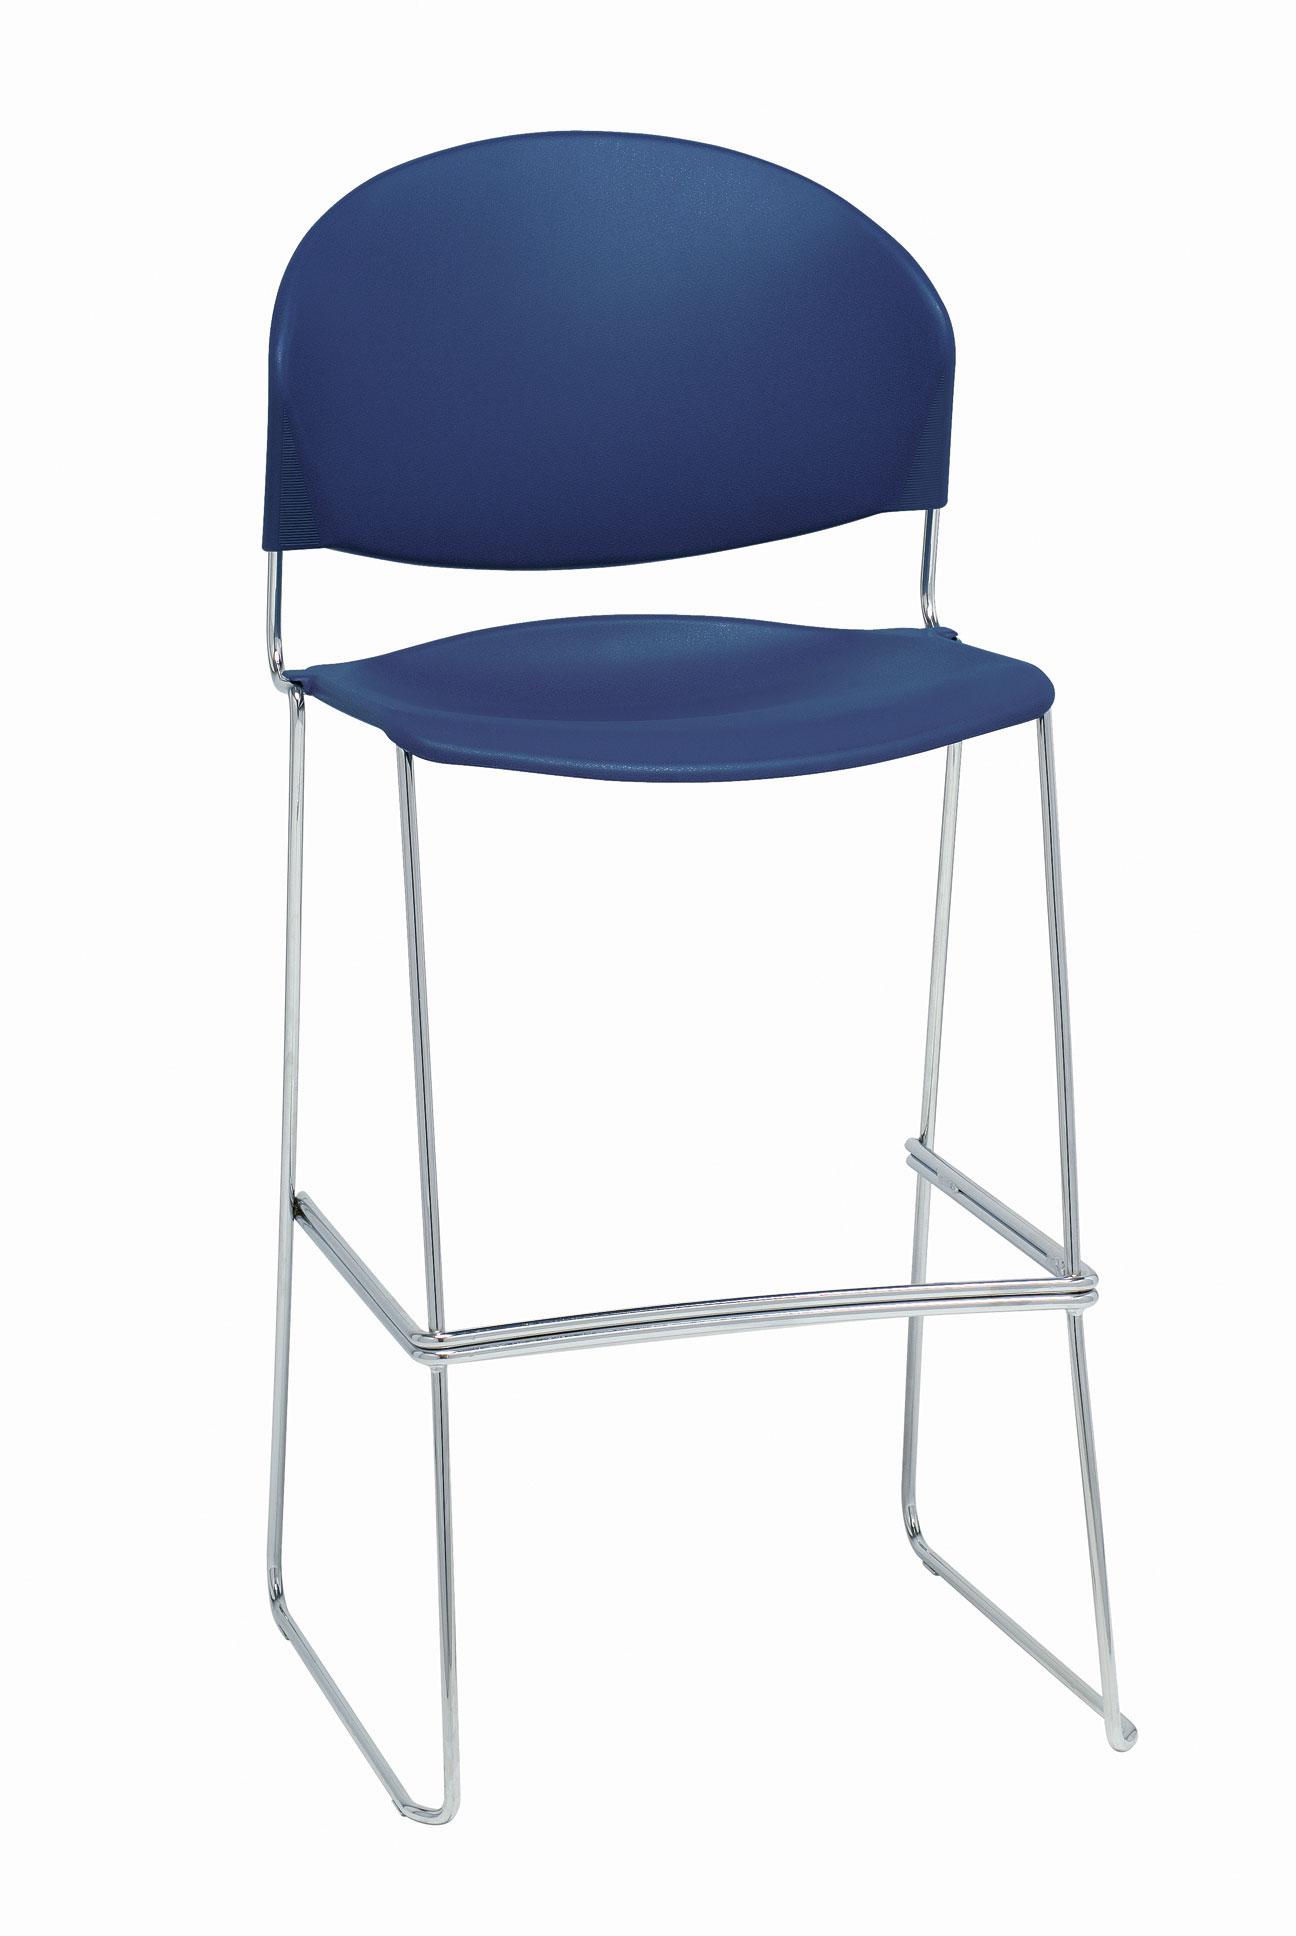 Excellent Trendway Jet Poly Cafe Height Chair Studio 71 Gsa Bpa Beatyapartments Chair Design Images Beatyapartmentscom